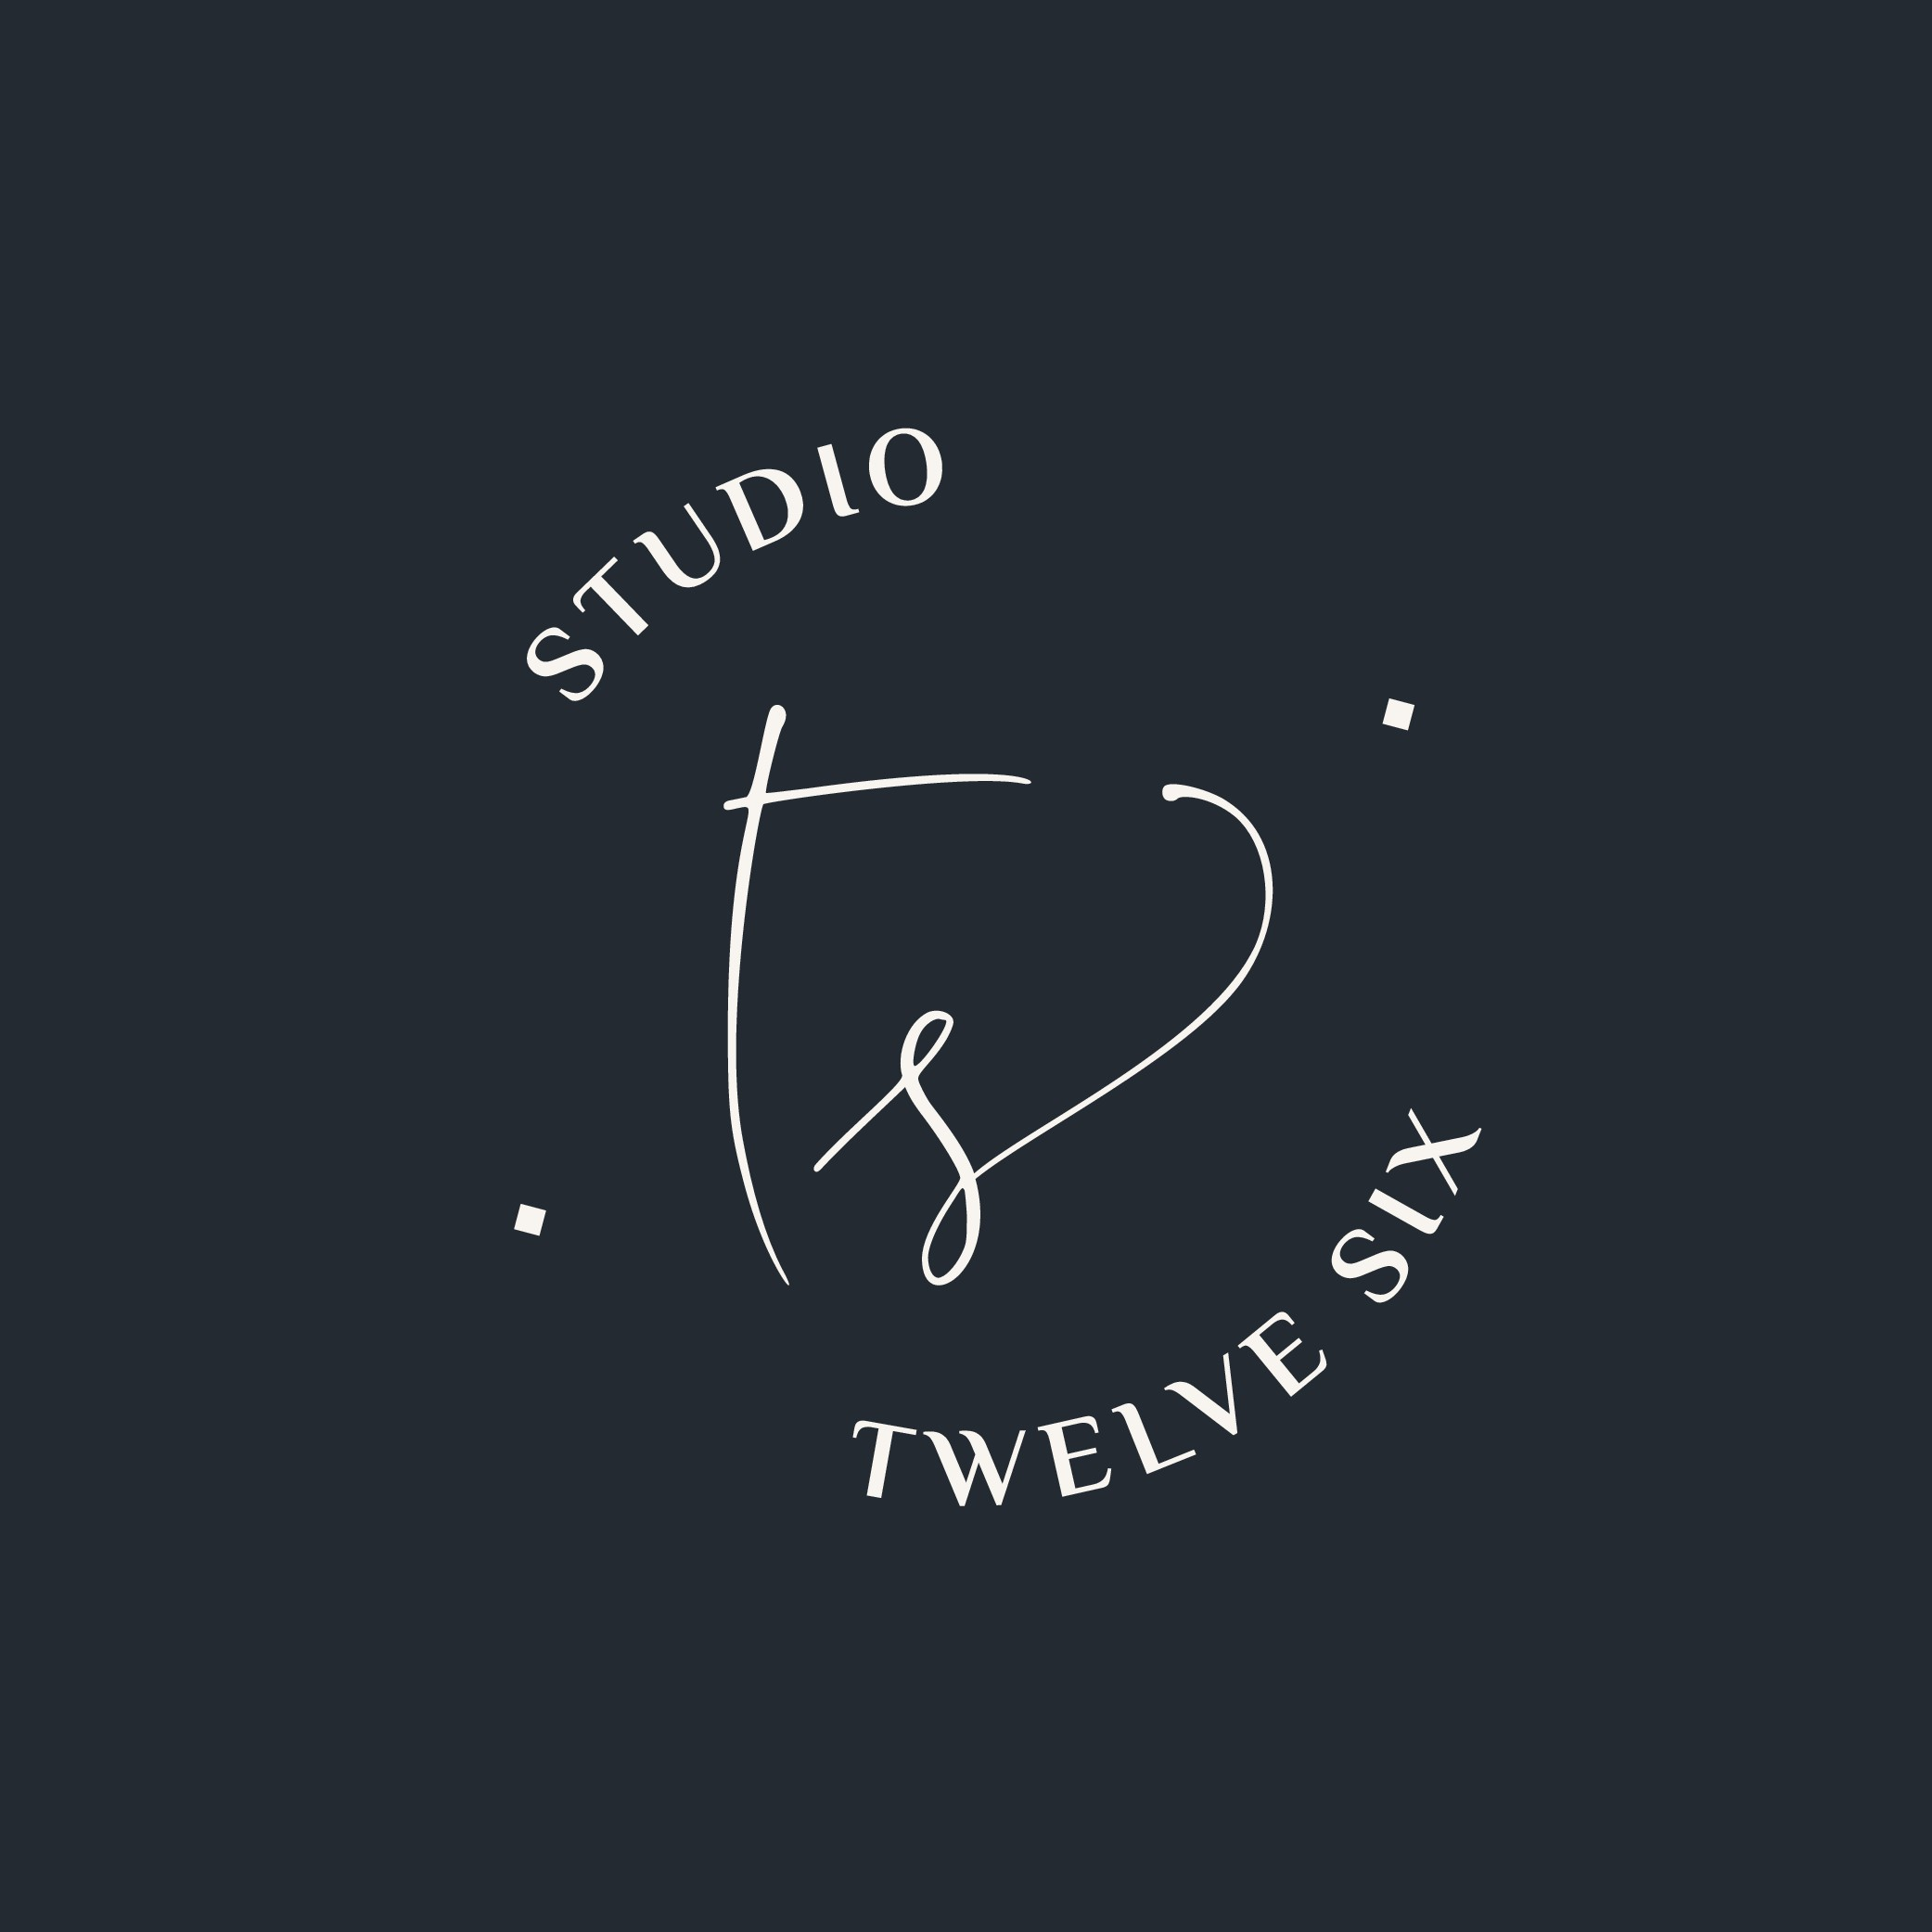 We need a feminine but modern logo design for a new beauty studio